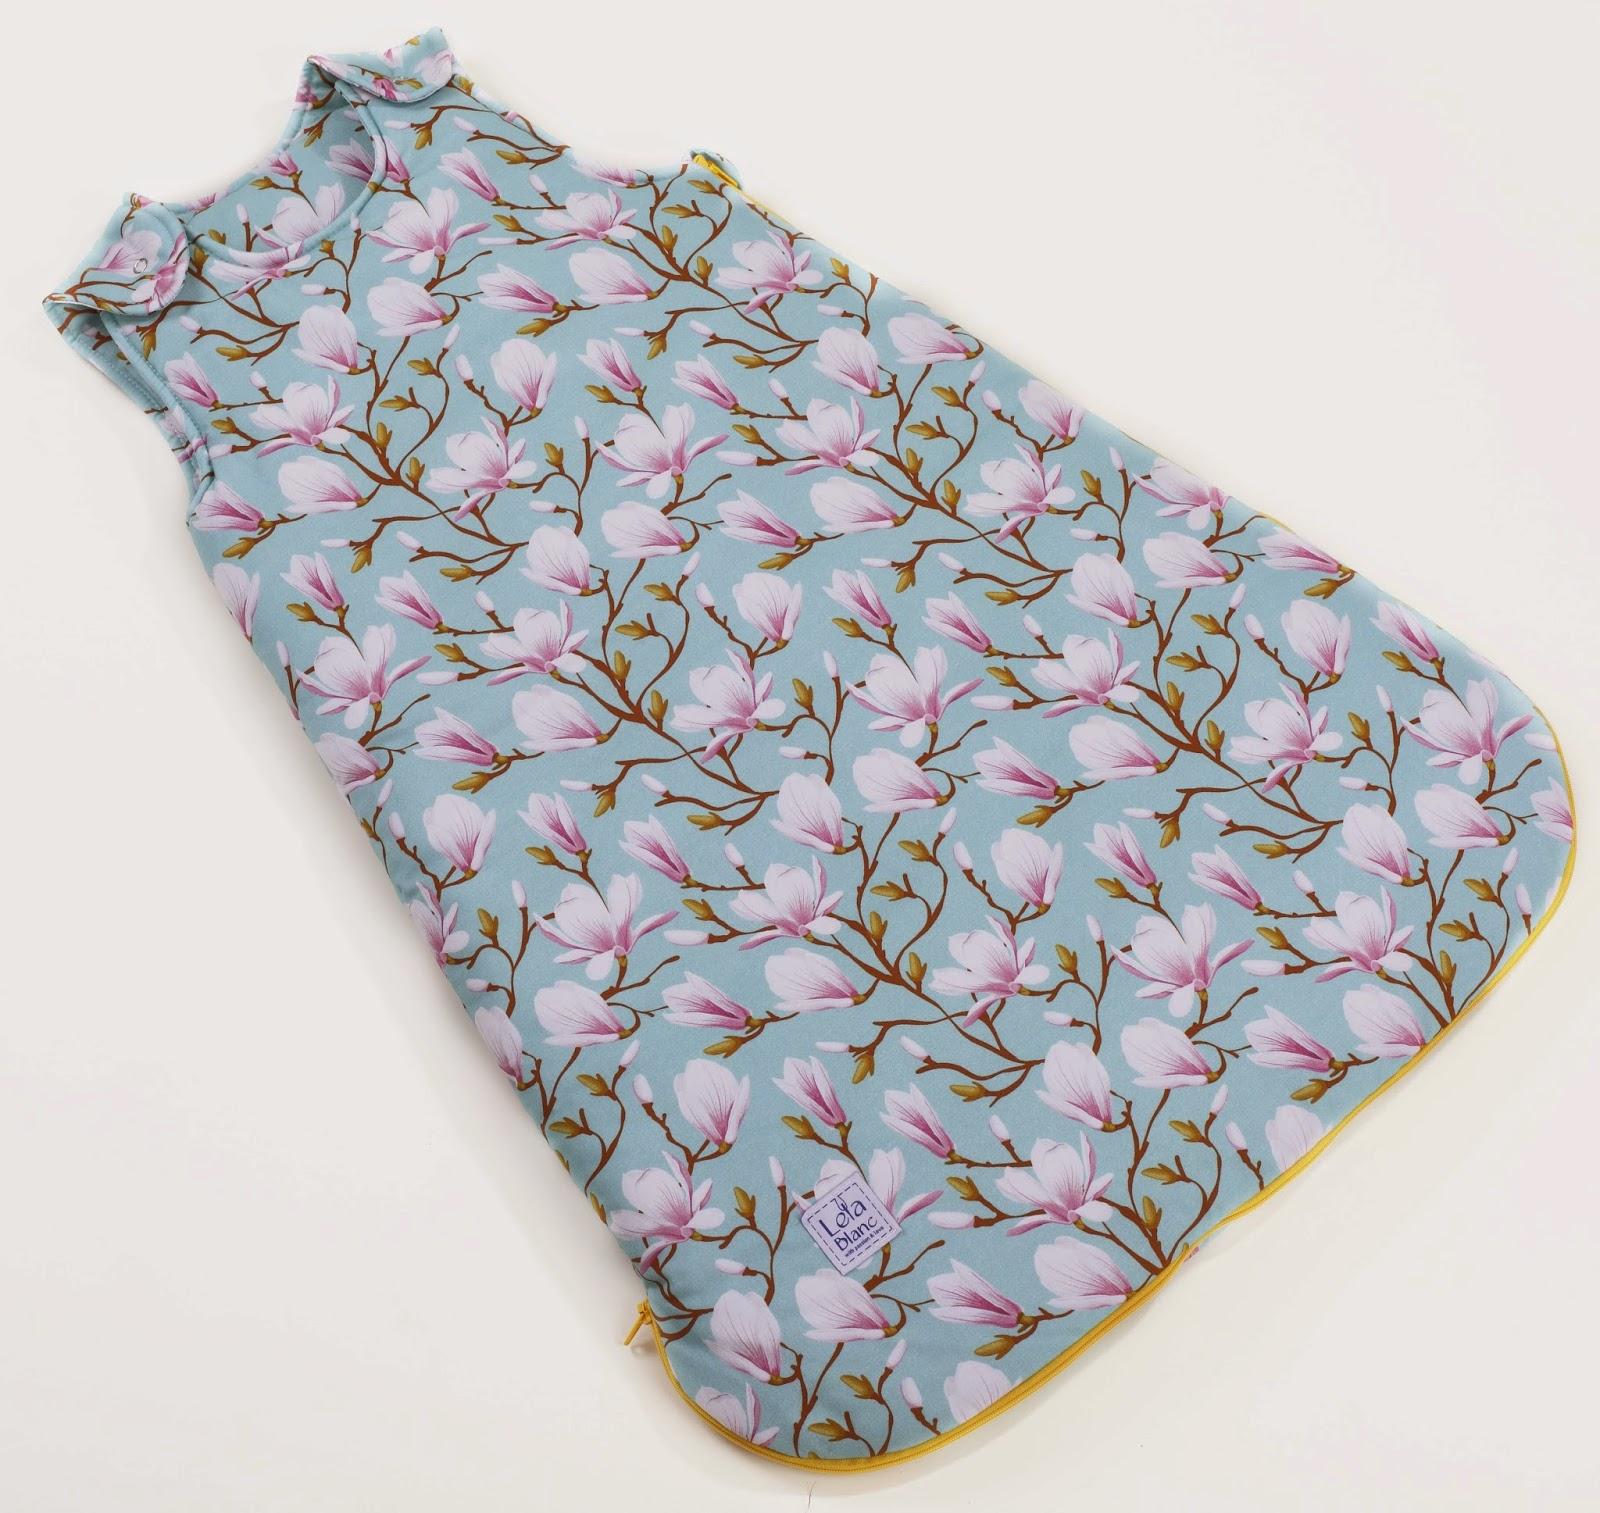 https://www.lelablanc.com/shop/produkty-sklep/spiworki/aspiworki-niemowlaka/spiworek-niemowlaka-magnolia.html